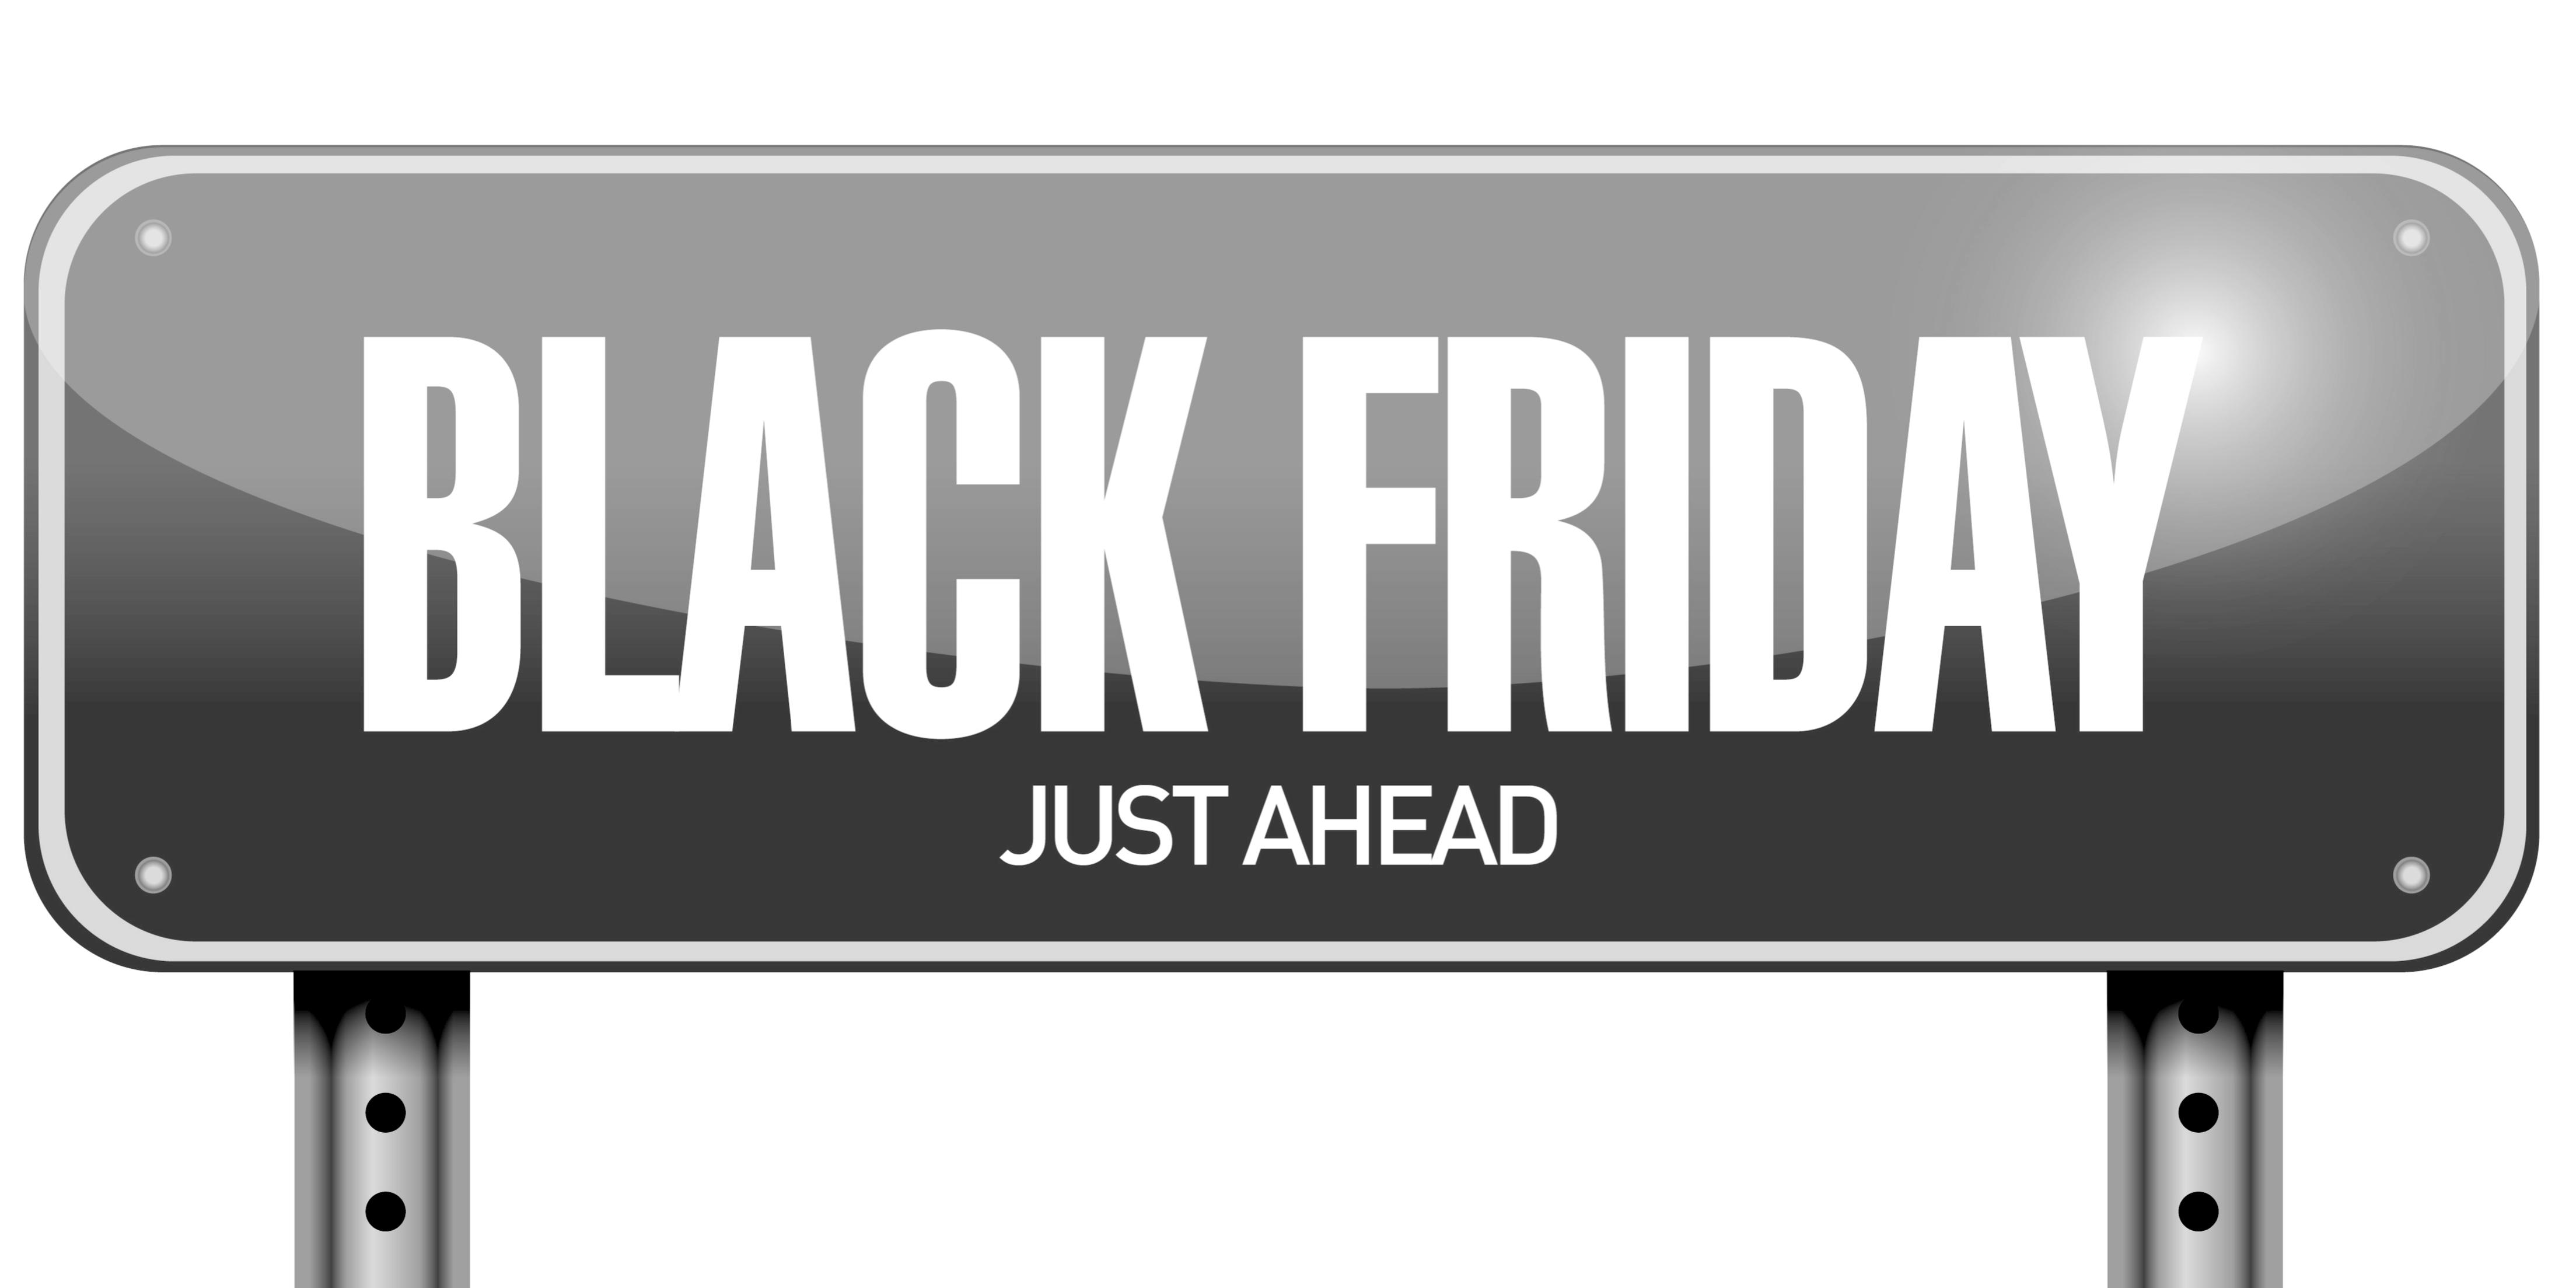 YOYO'dan erken Black Friday sürprizi!